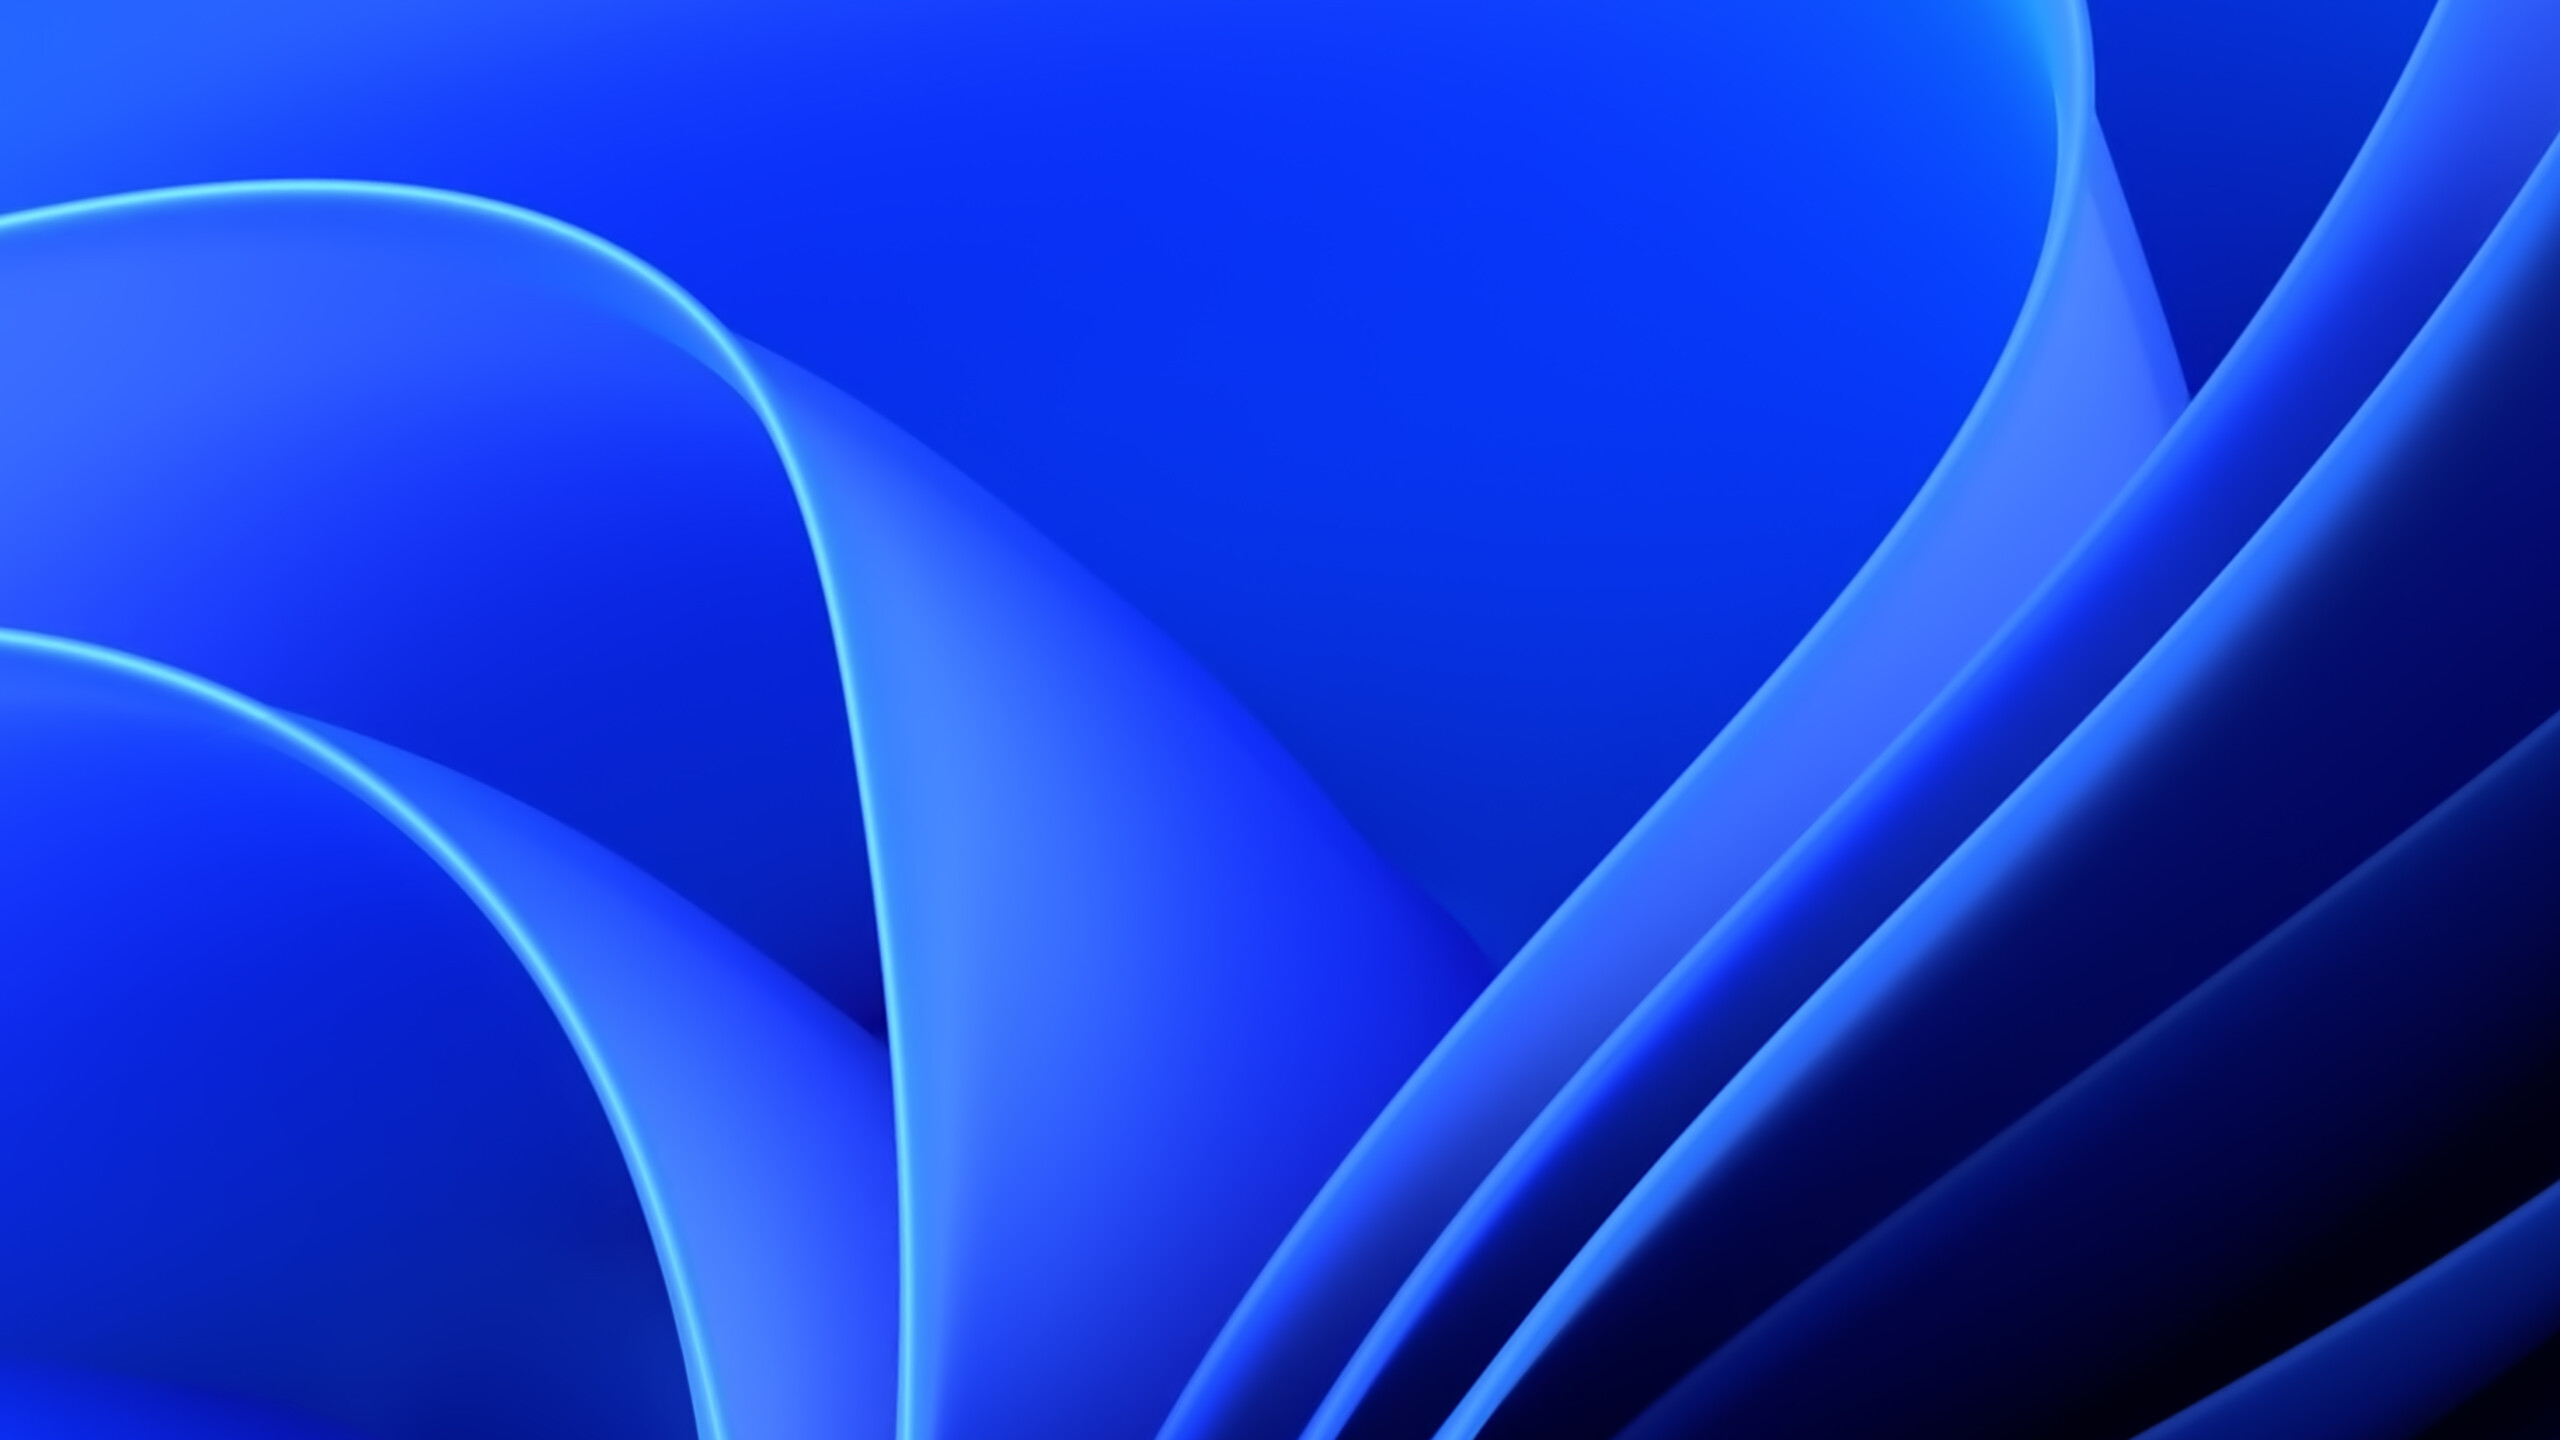 fond d'écran Windows 11 - 4